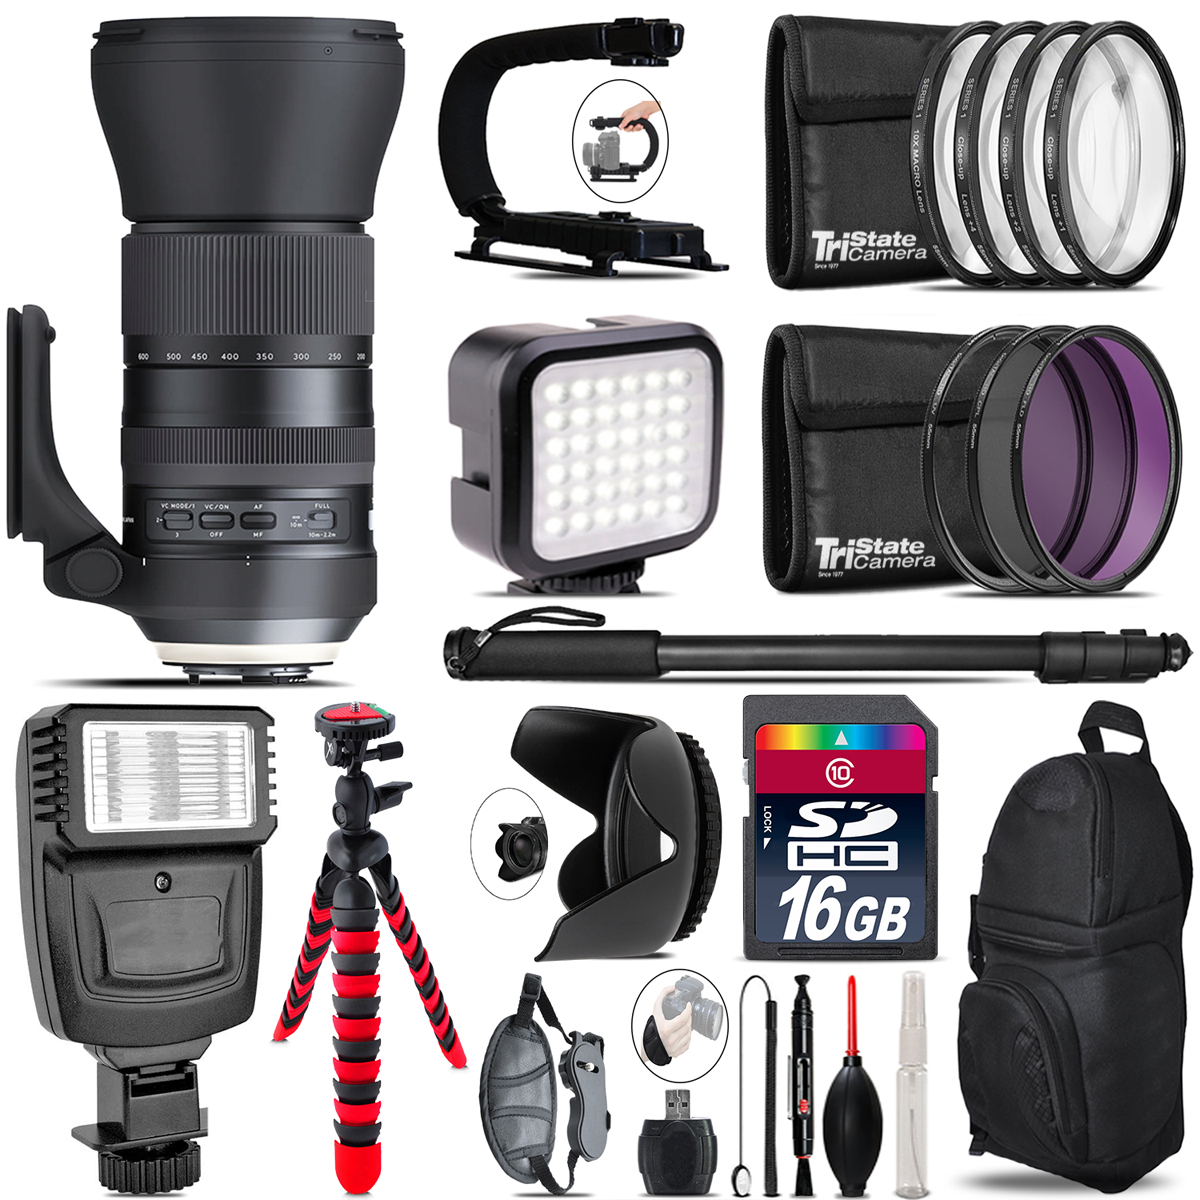 Tamron 150-600mm G2 for Nikon - Video Kit + Flash - 16GB Accessory Bundle *FREE SHIPPING*